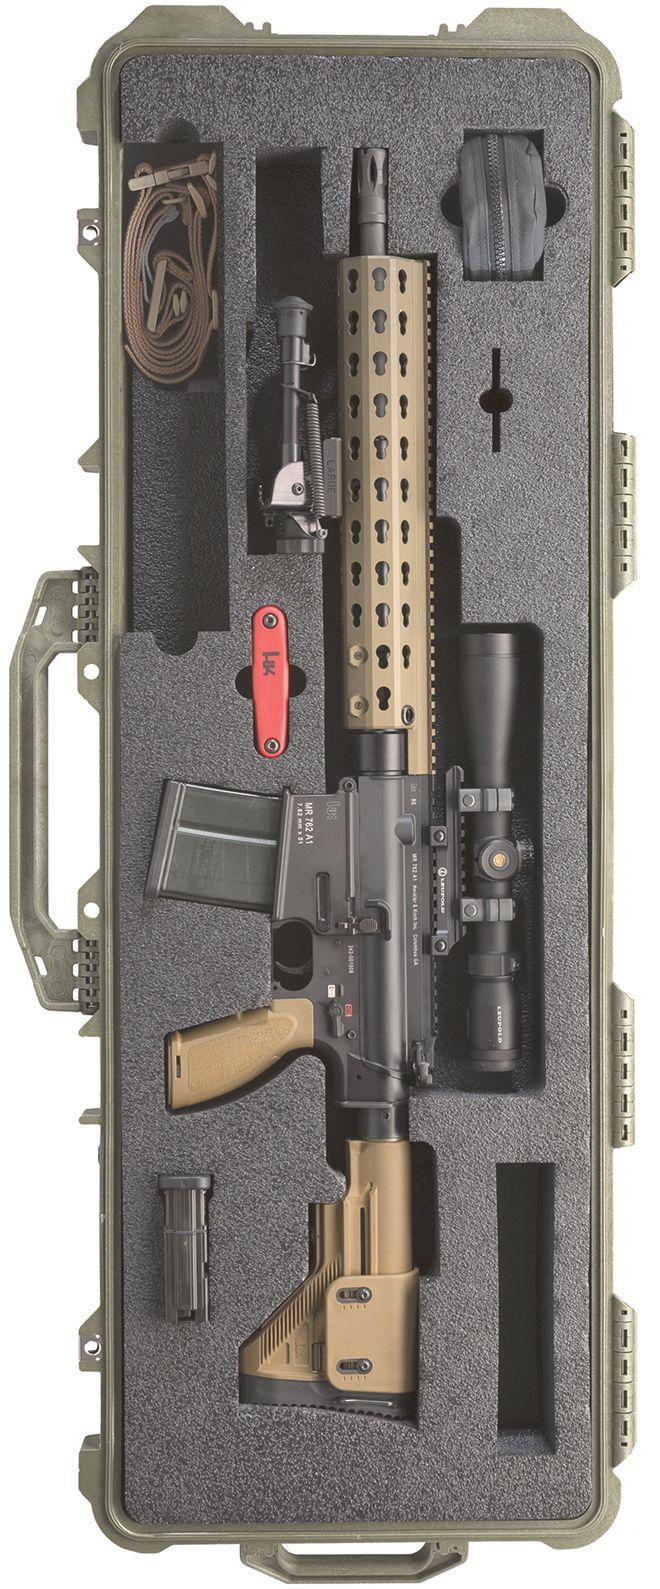 MR762A1 Long Rifle Package II http://riflescopescenter.com/category/nikon-riflescope-reviews/